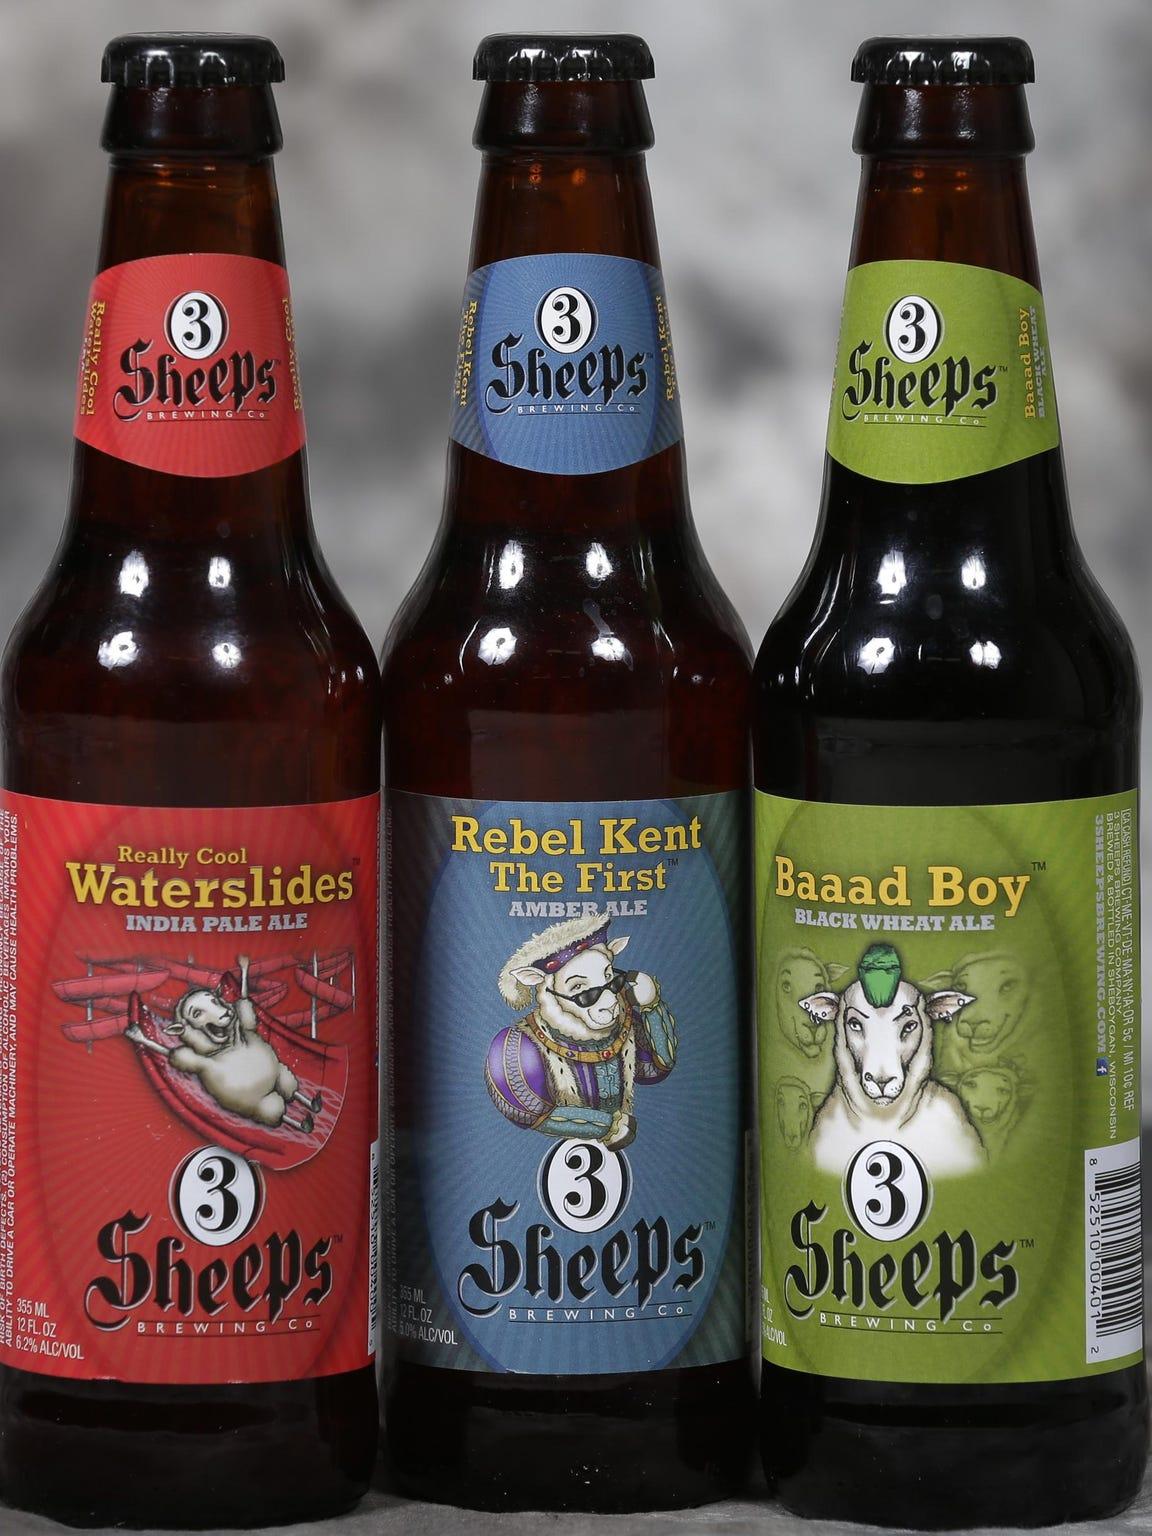 Sheboygan brewery 3 Sheeps Brewing will have their